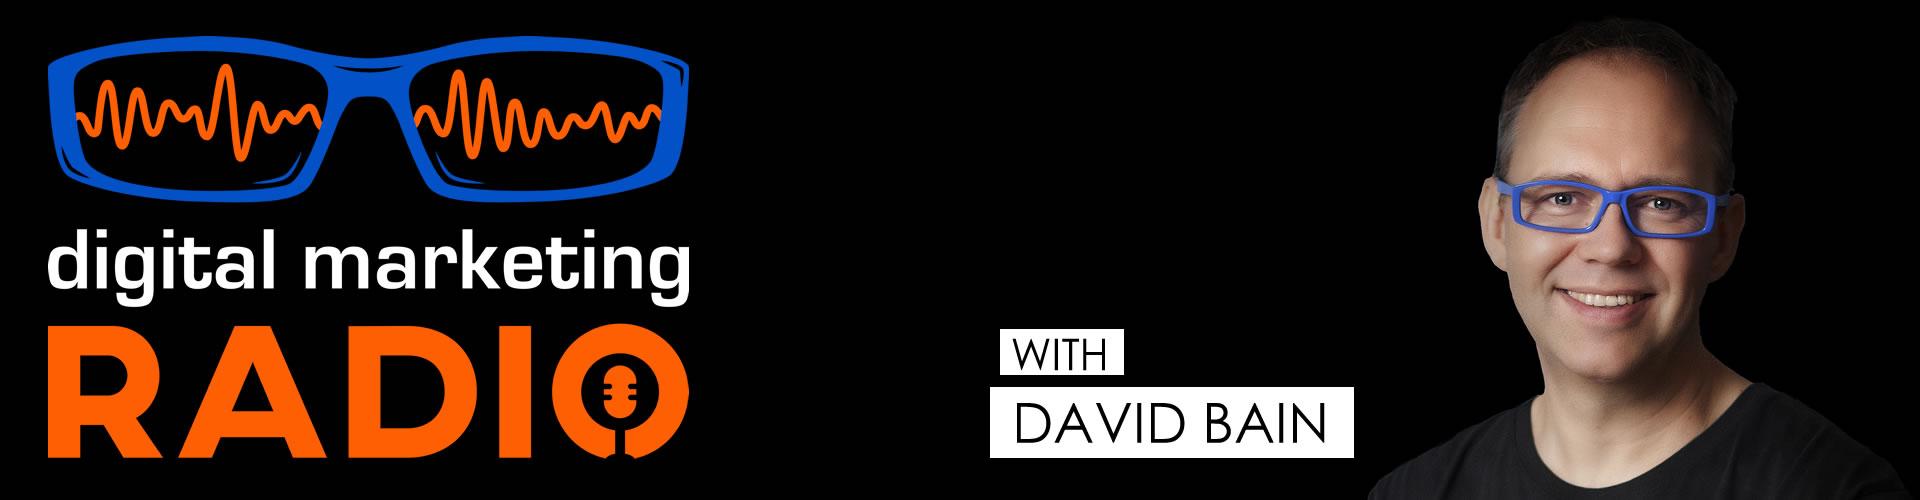 Digital Marketing Radio Podcast And Youtube Show With David Bain